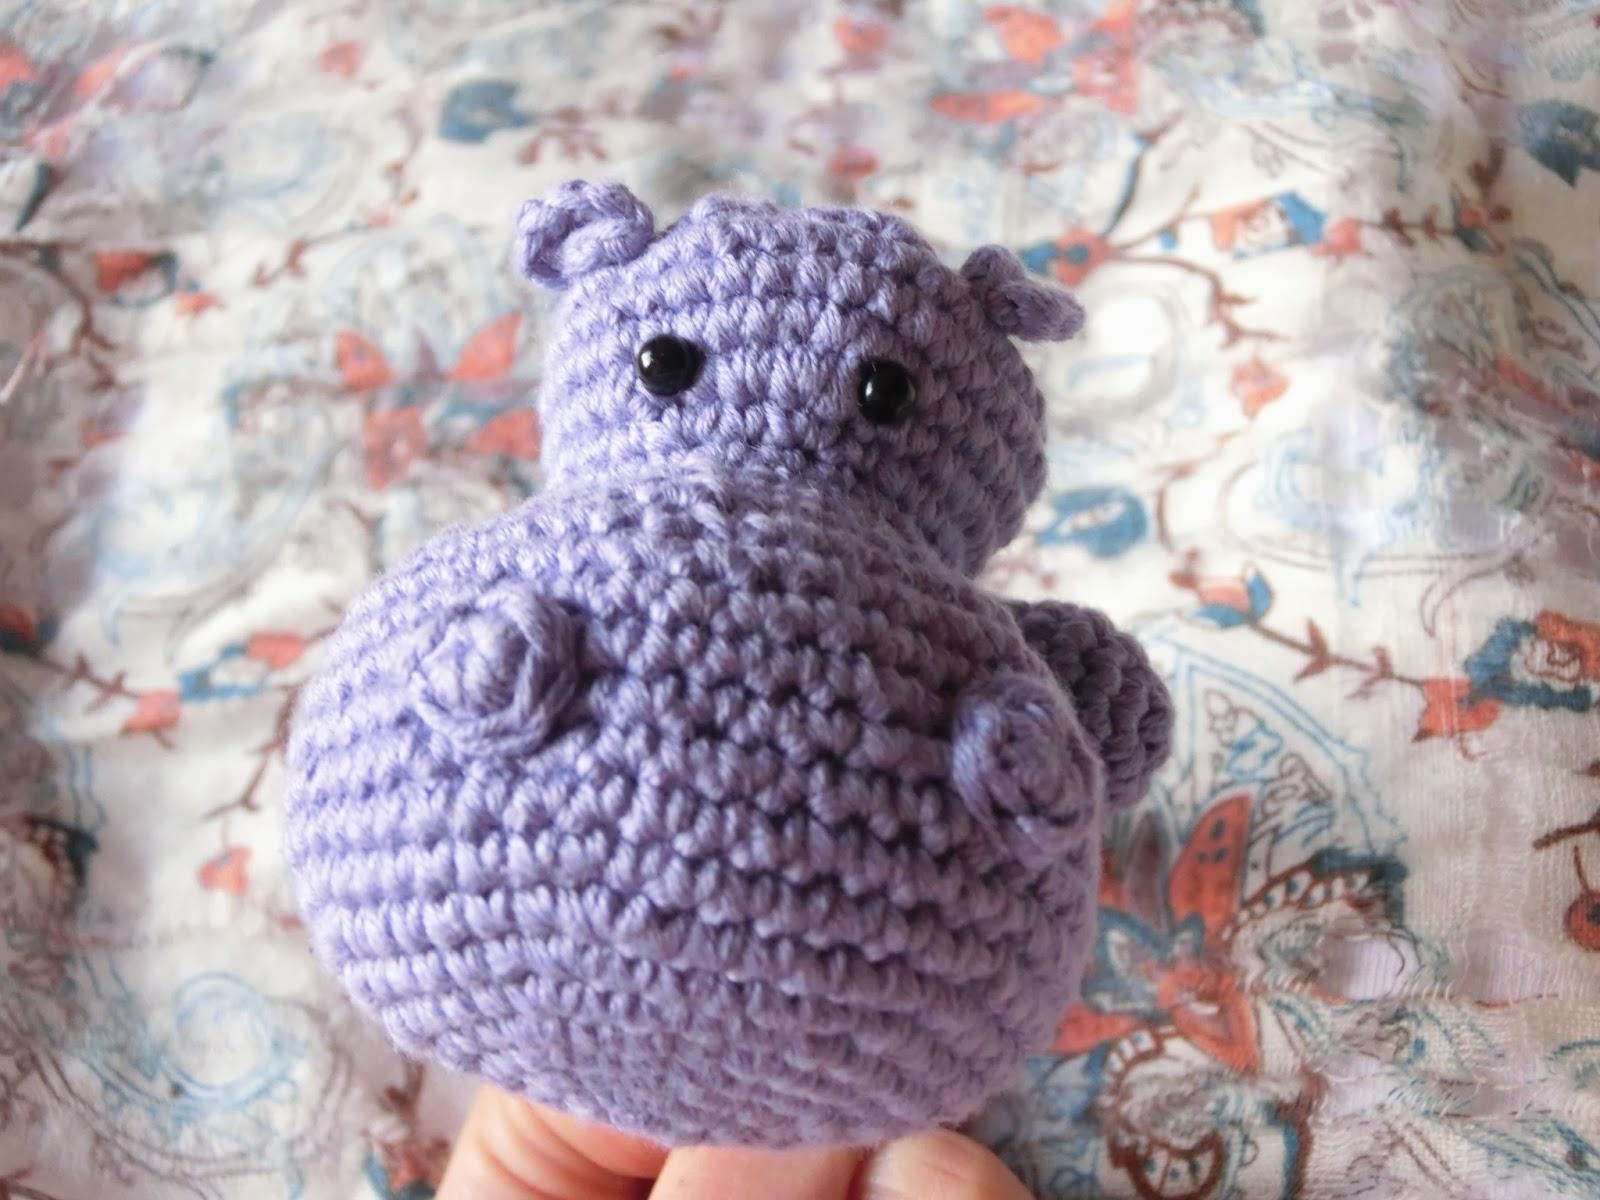 maia_knit: Marioneta hipopótamo